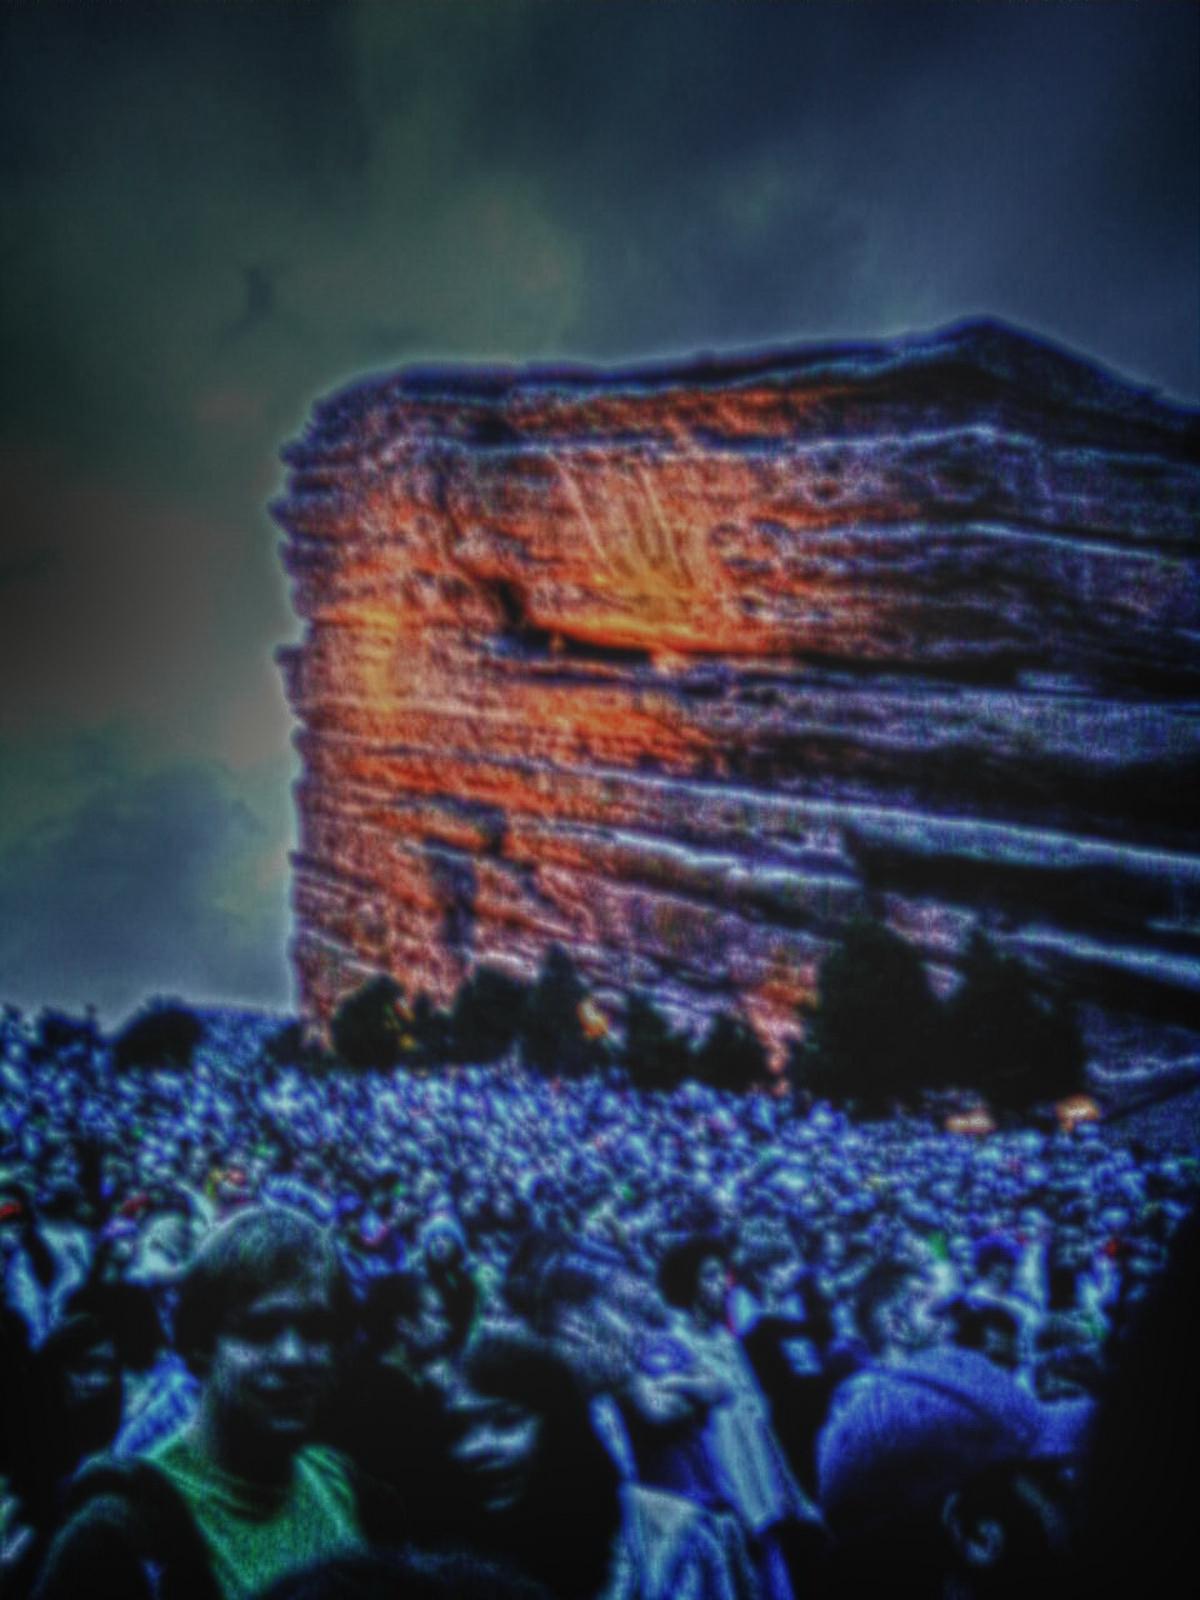 colorado, morrisison, red rocks, ziggy marley, , photo